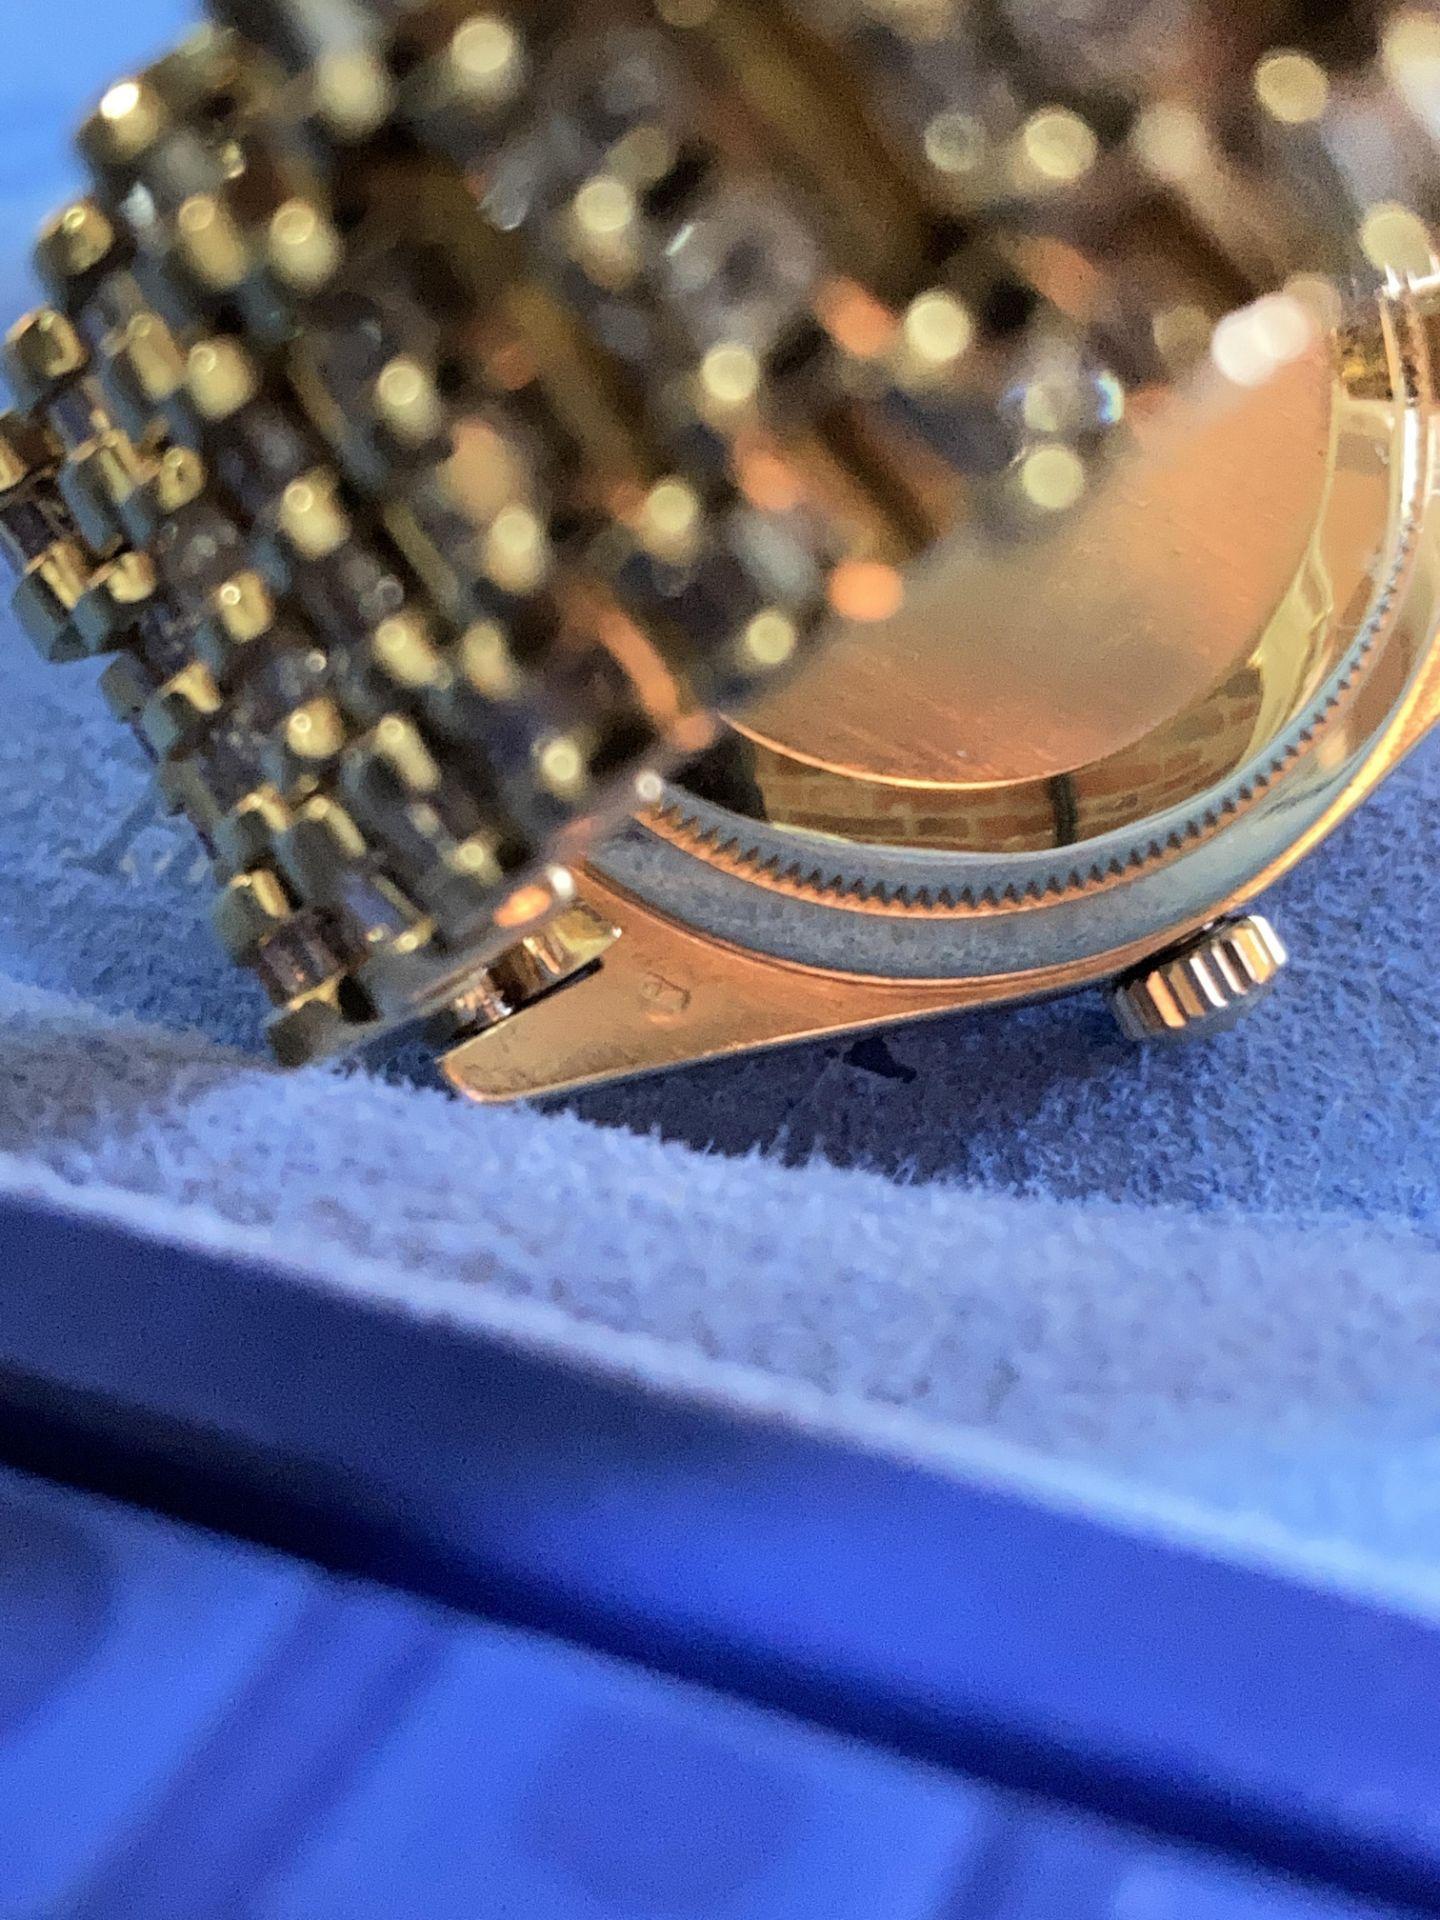 GENTS 36mm ROLEX DAYDATE YELLOW GOLD DIAMOND WATCH - Image 17 of 21